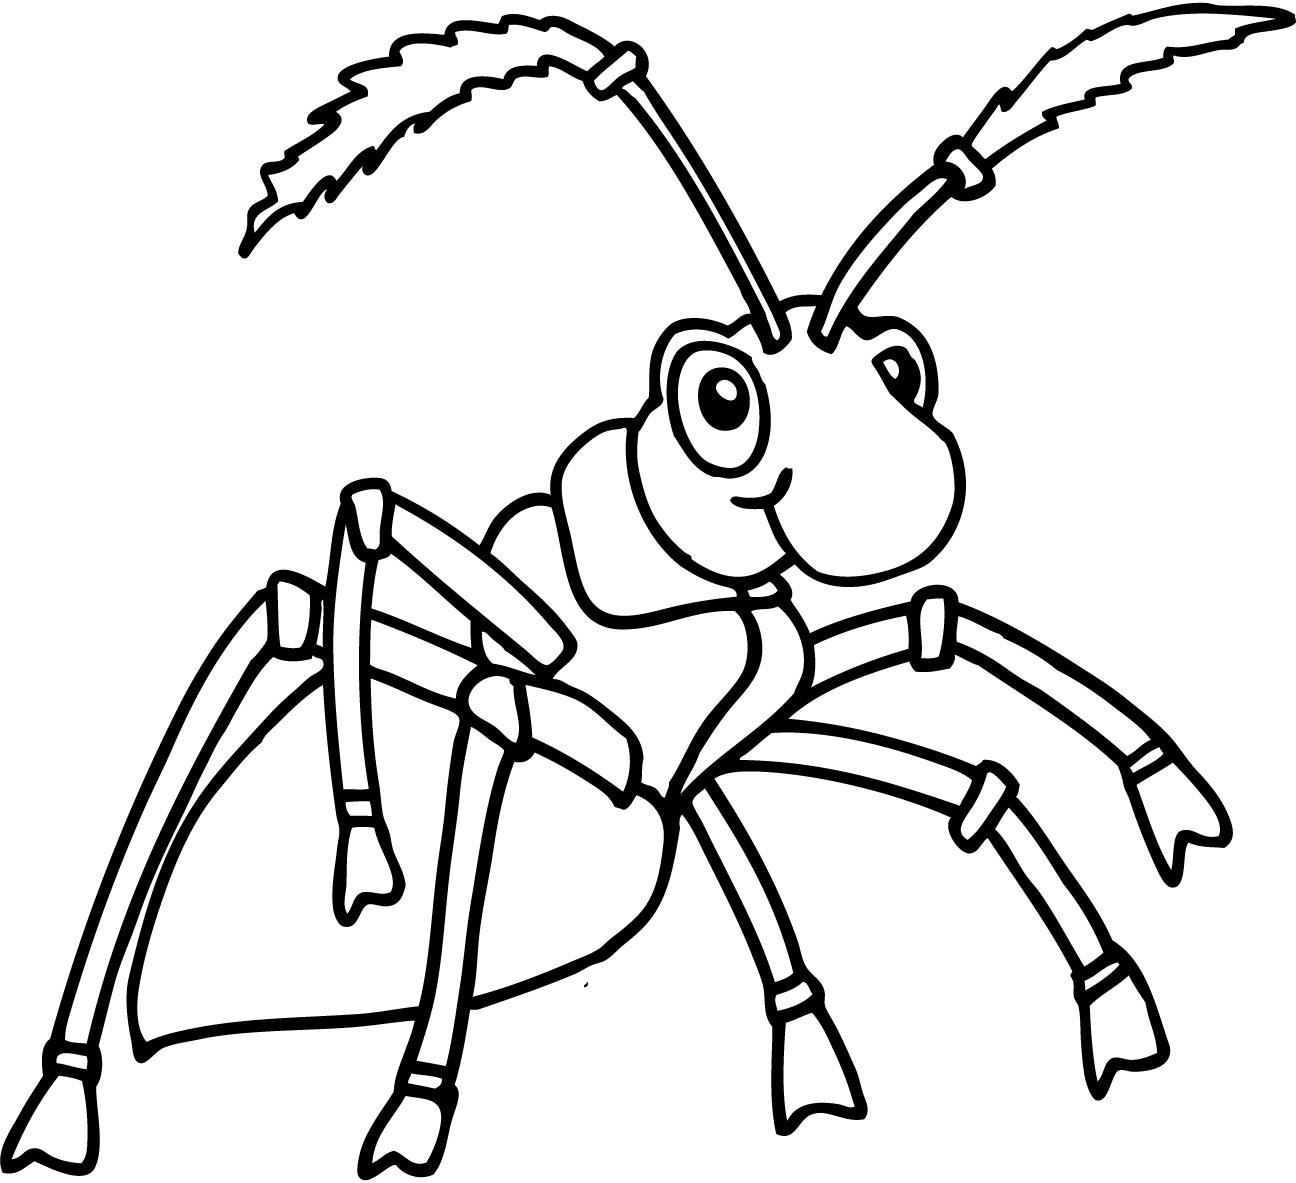 Free Preschool Ant Cliparts Download Free Clip Art Free Clip Art On Clipart Library